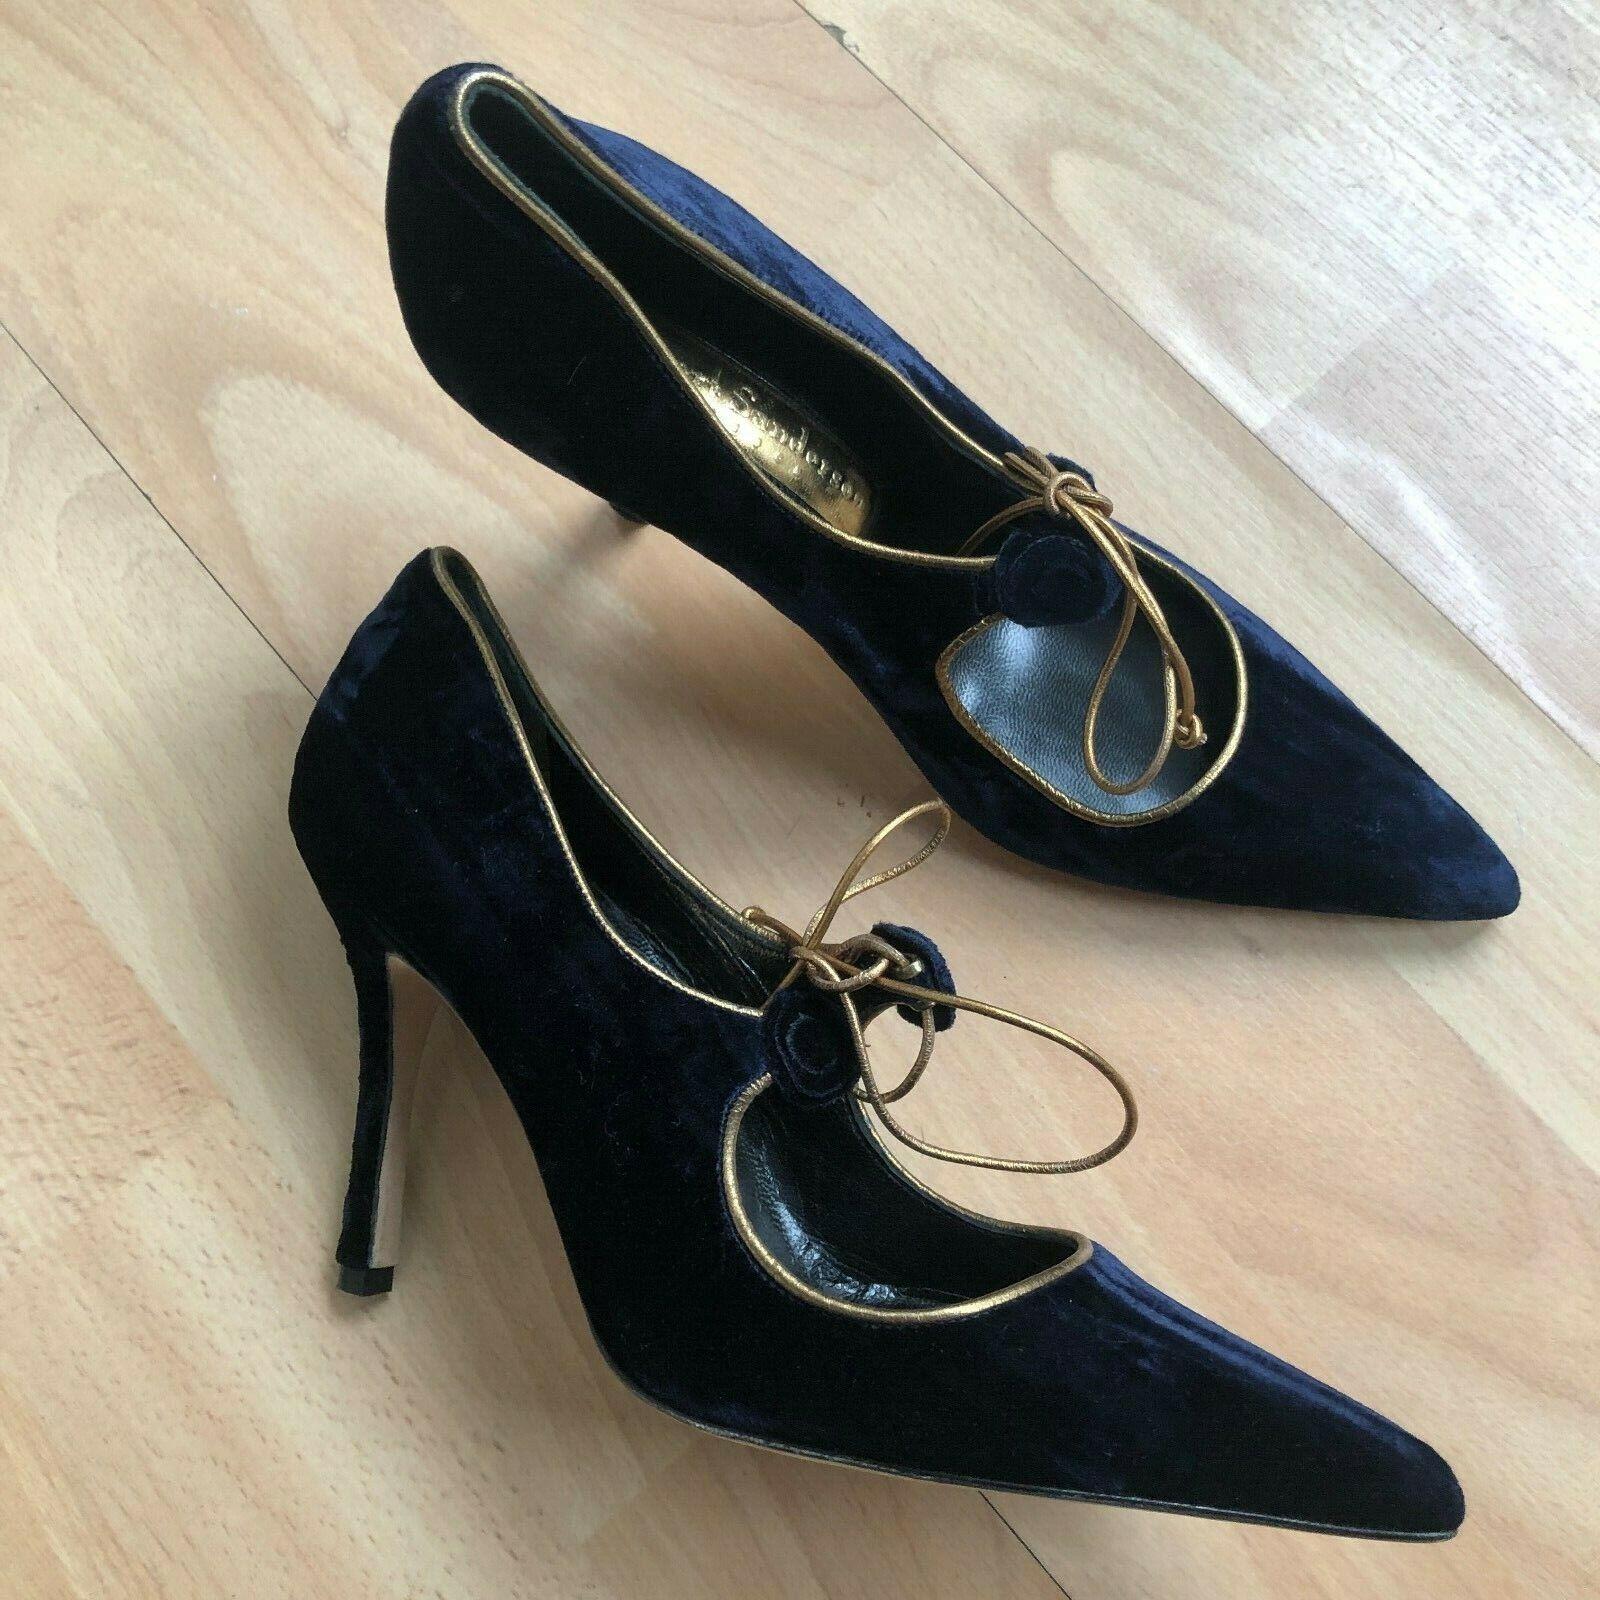 Rupert Sanderson sammet sammet sammet Mary Jane Pump skor klackar  online mode shopping